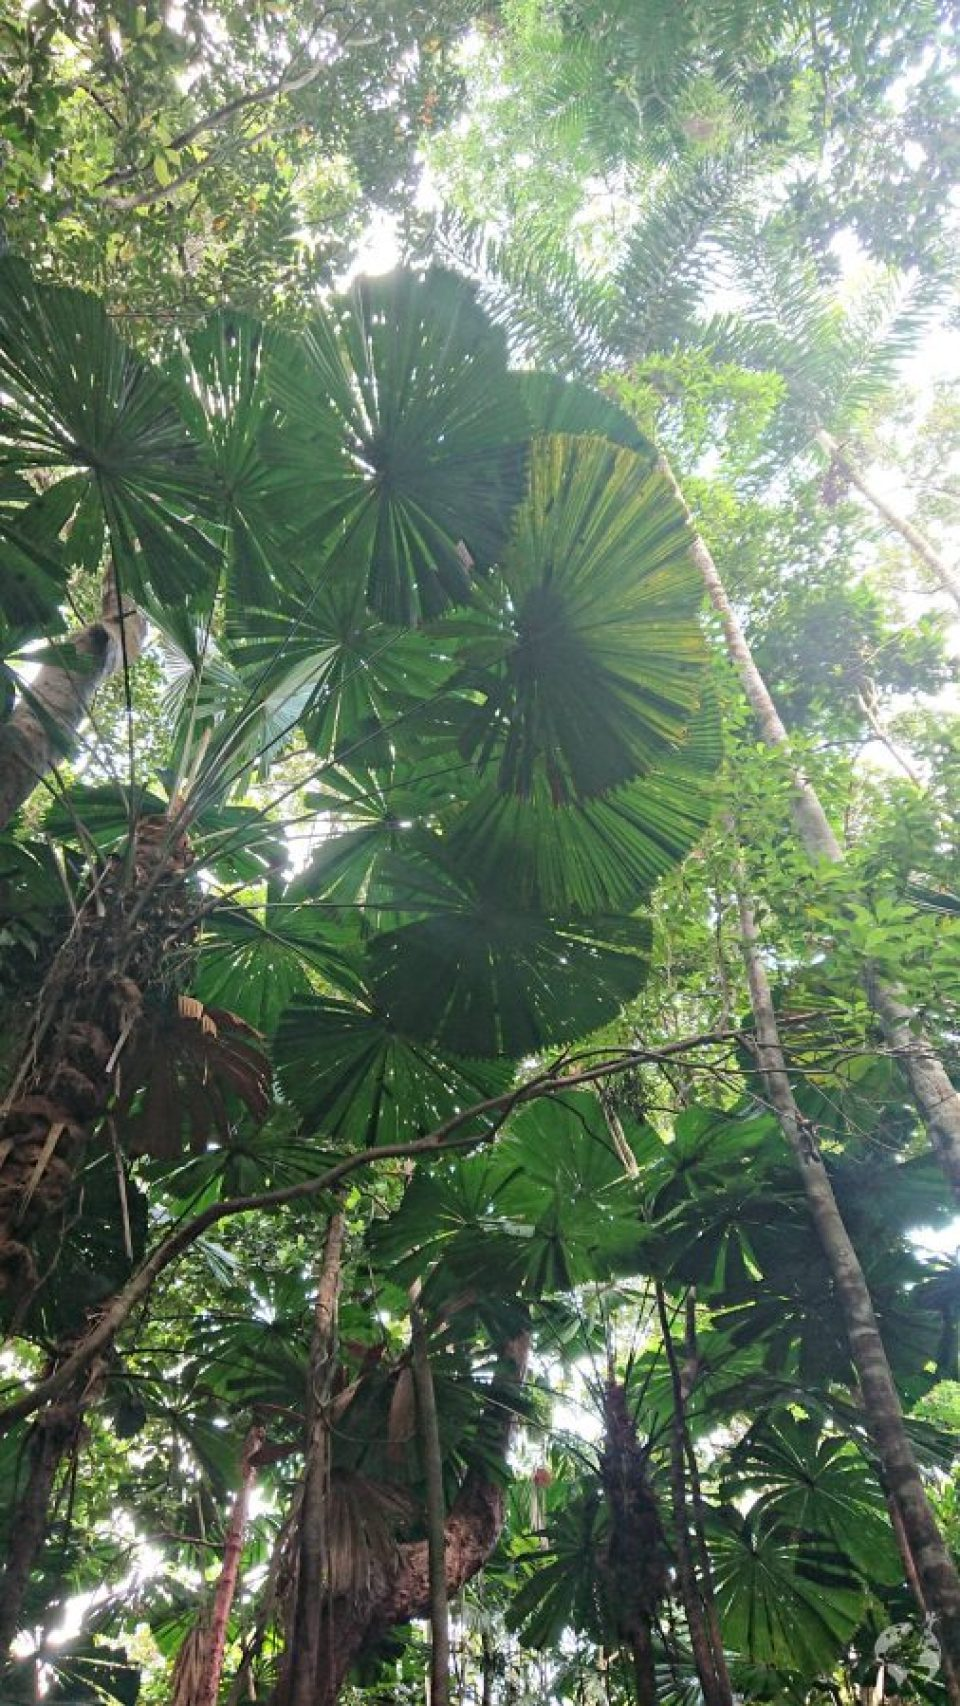 daintree rainforest how to go